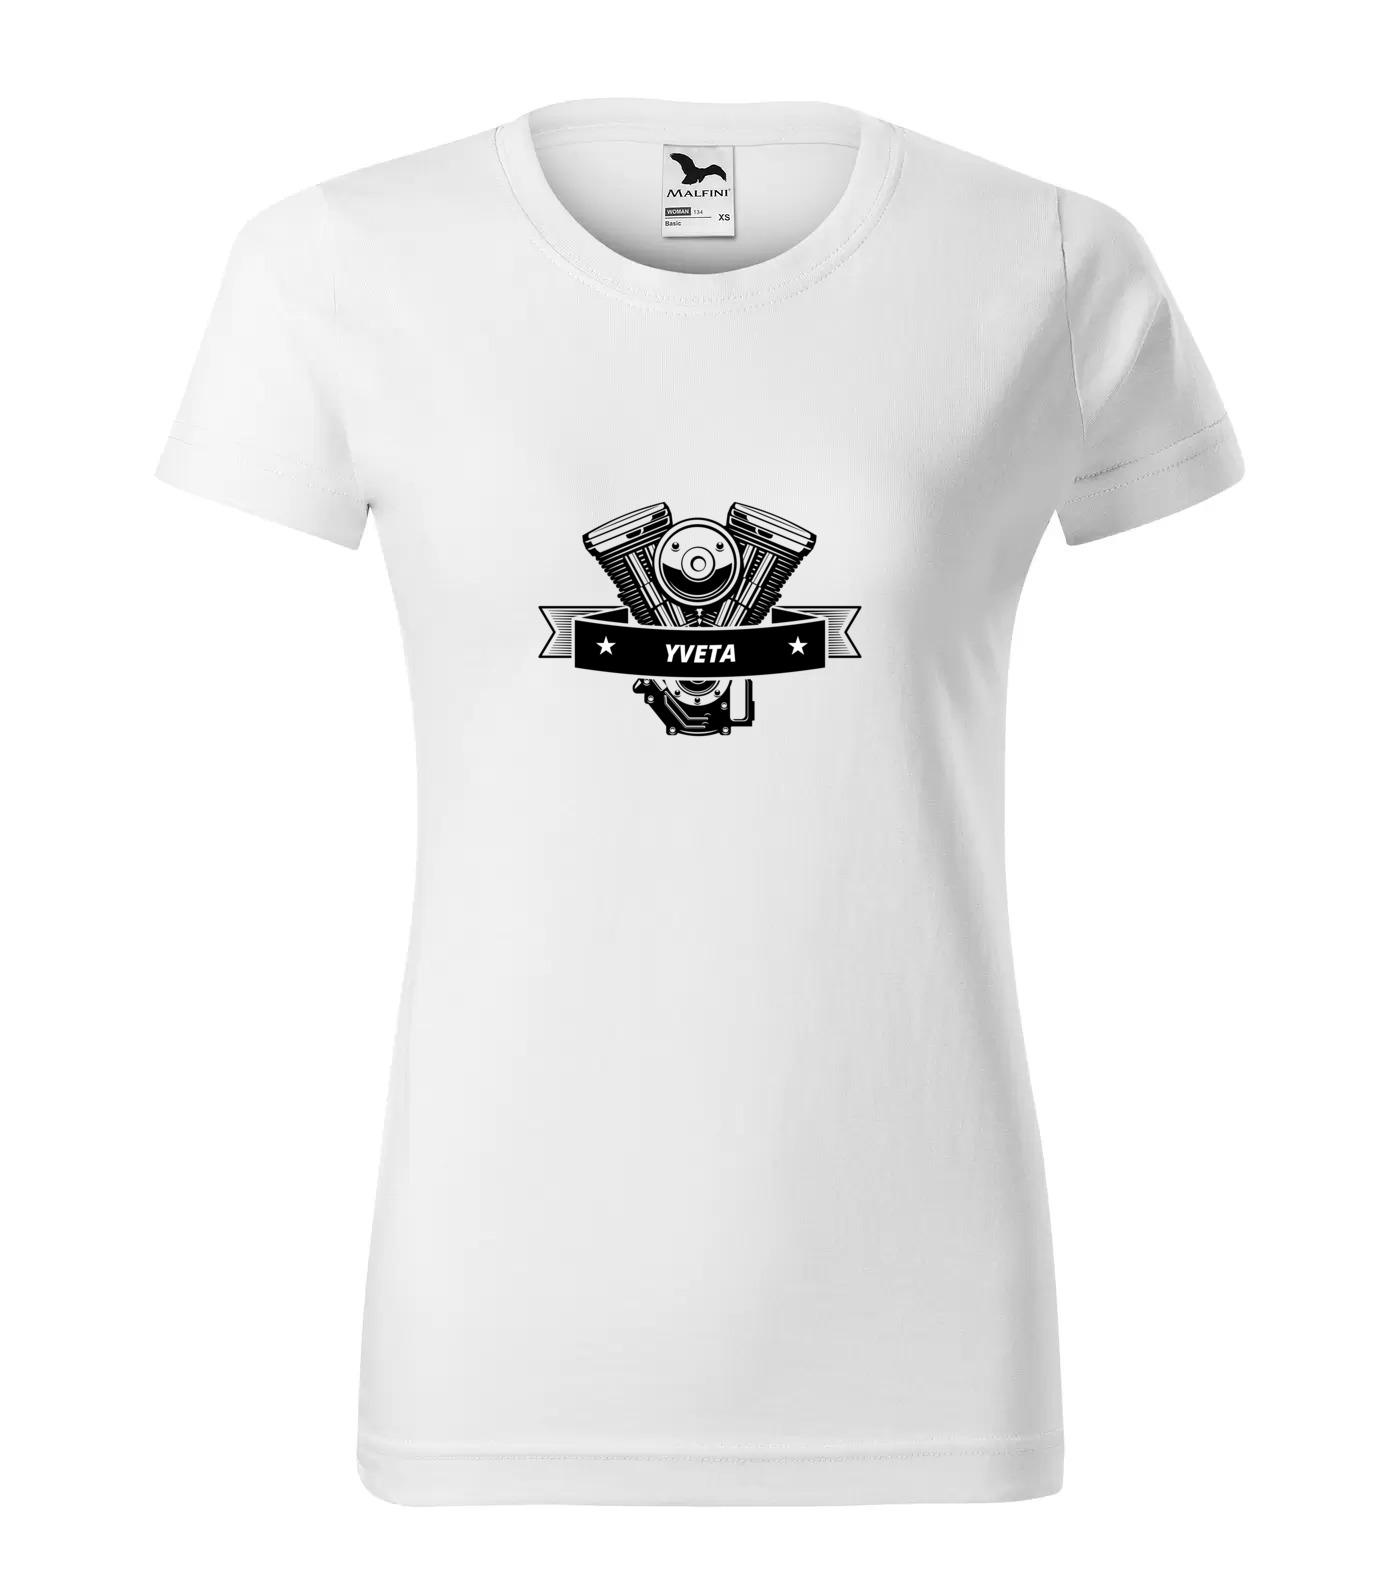 Tričko Motorkářka Yveta